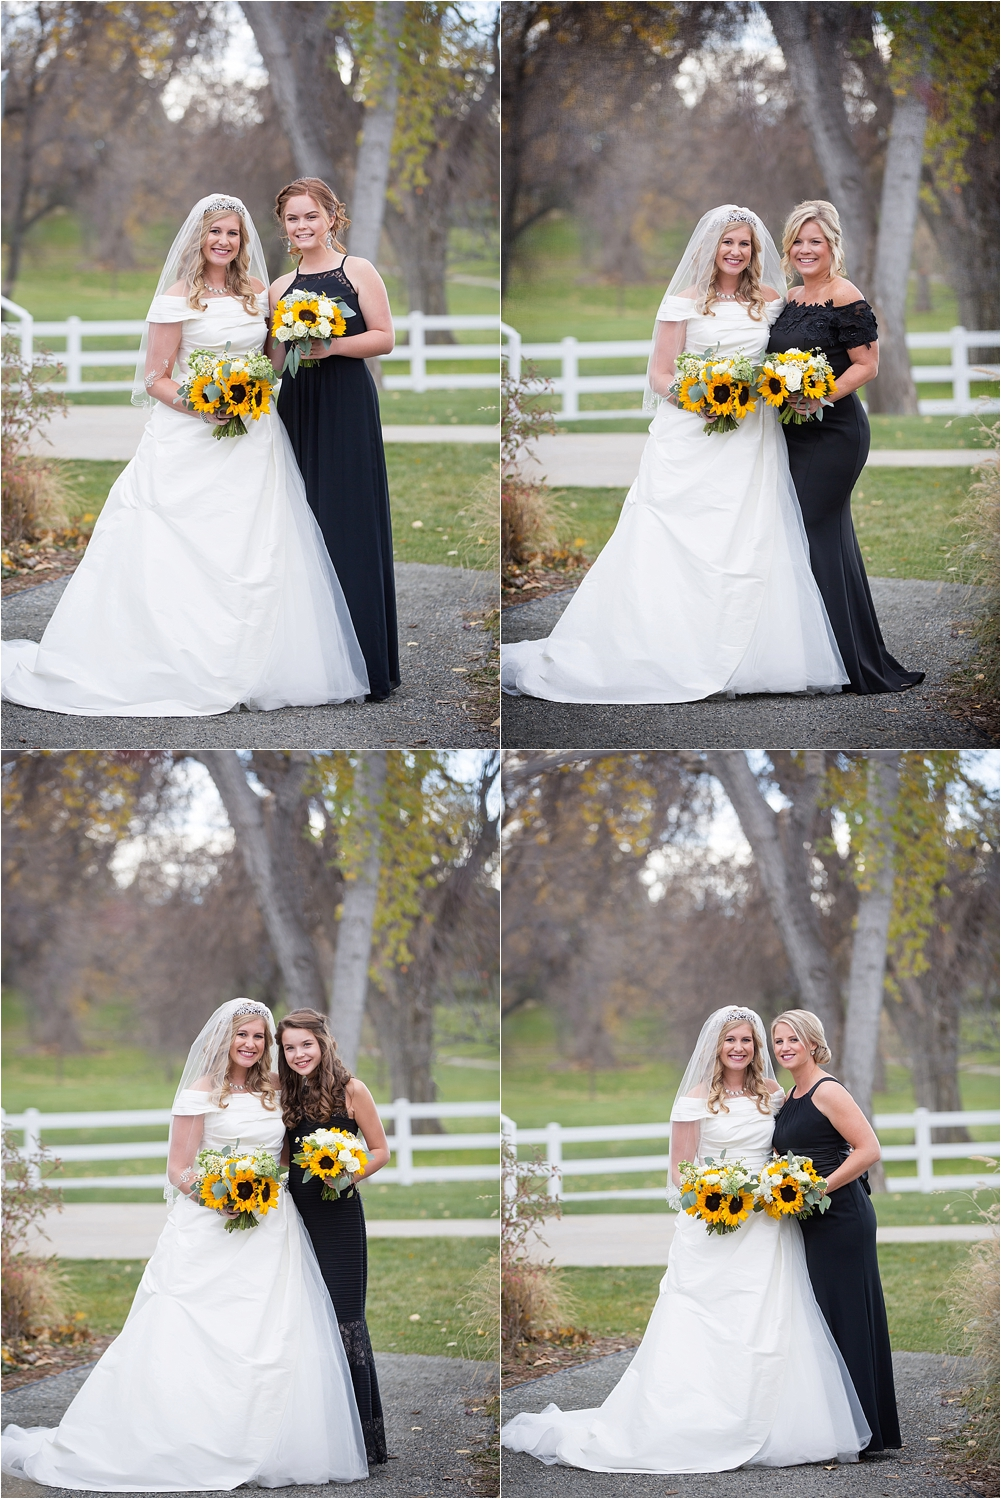 Laura + Chris' Raccoon Creek Wedding_0032.jpg